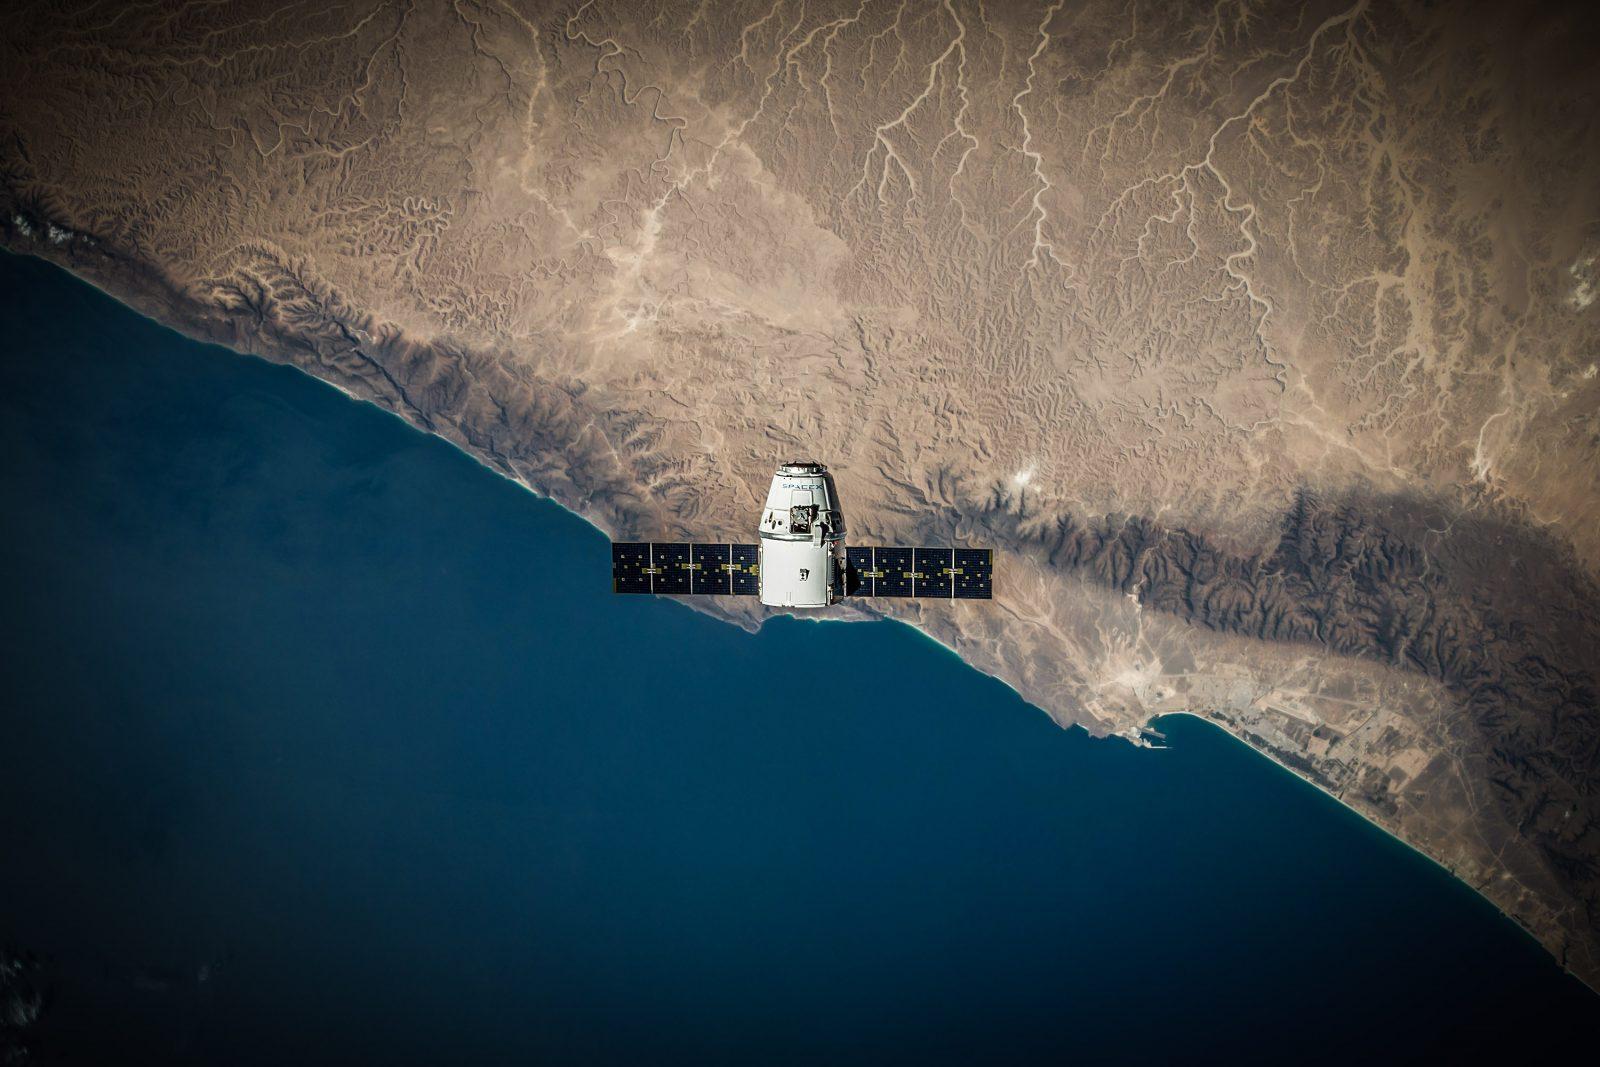 Les satellites naturels et artificiels